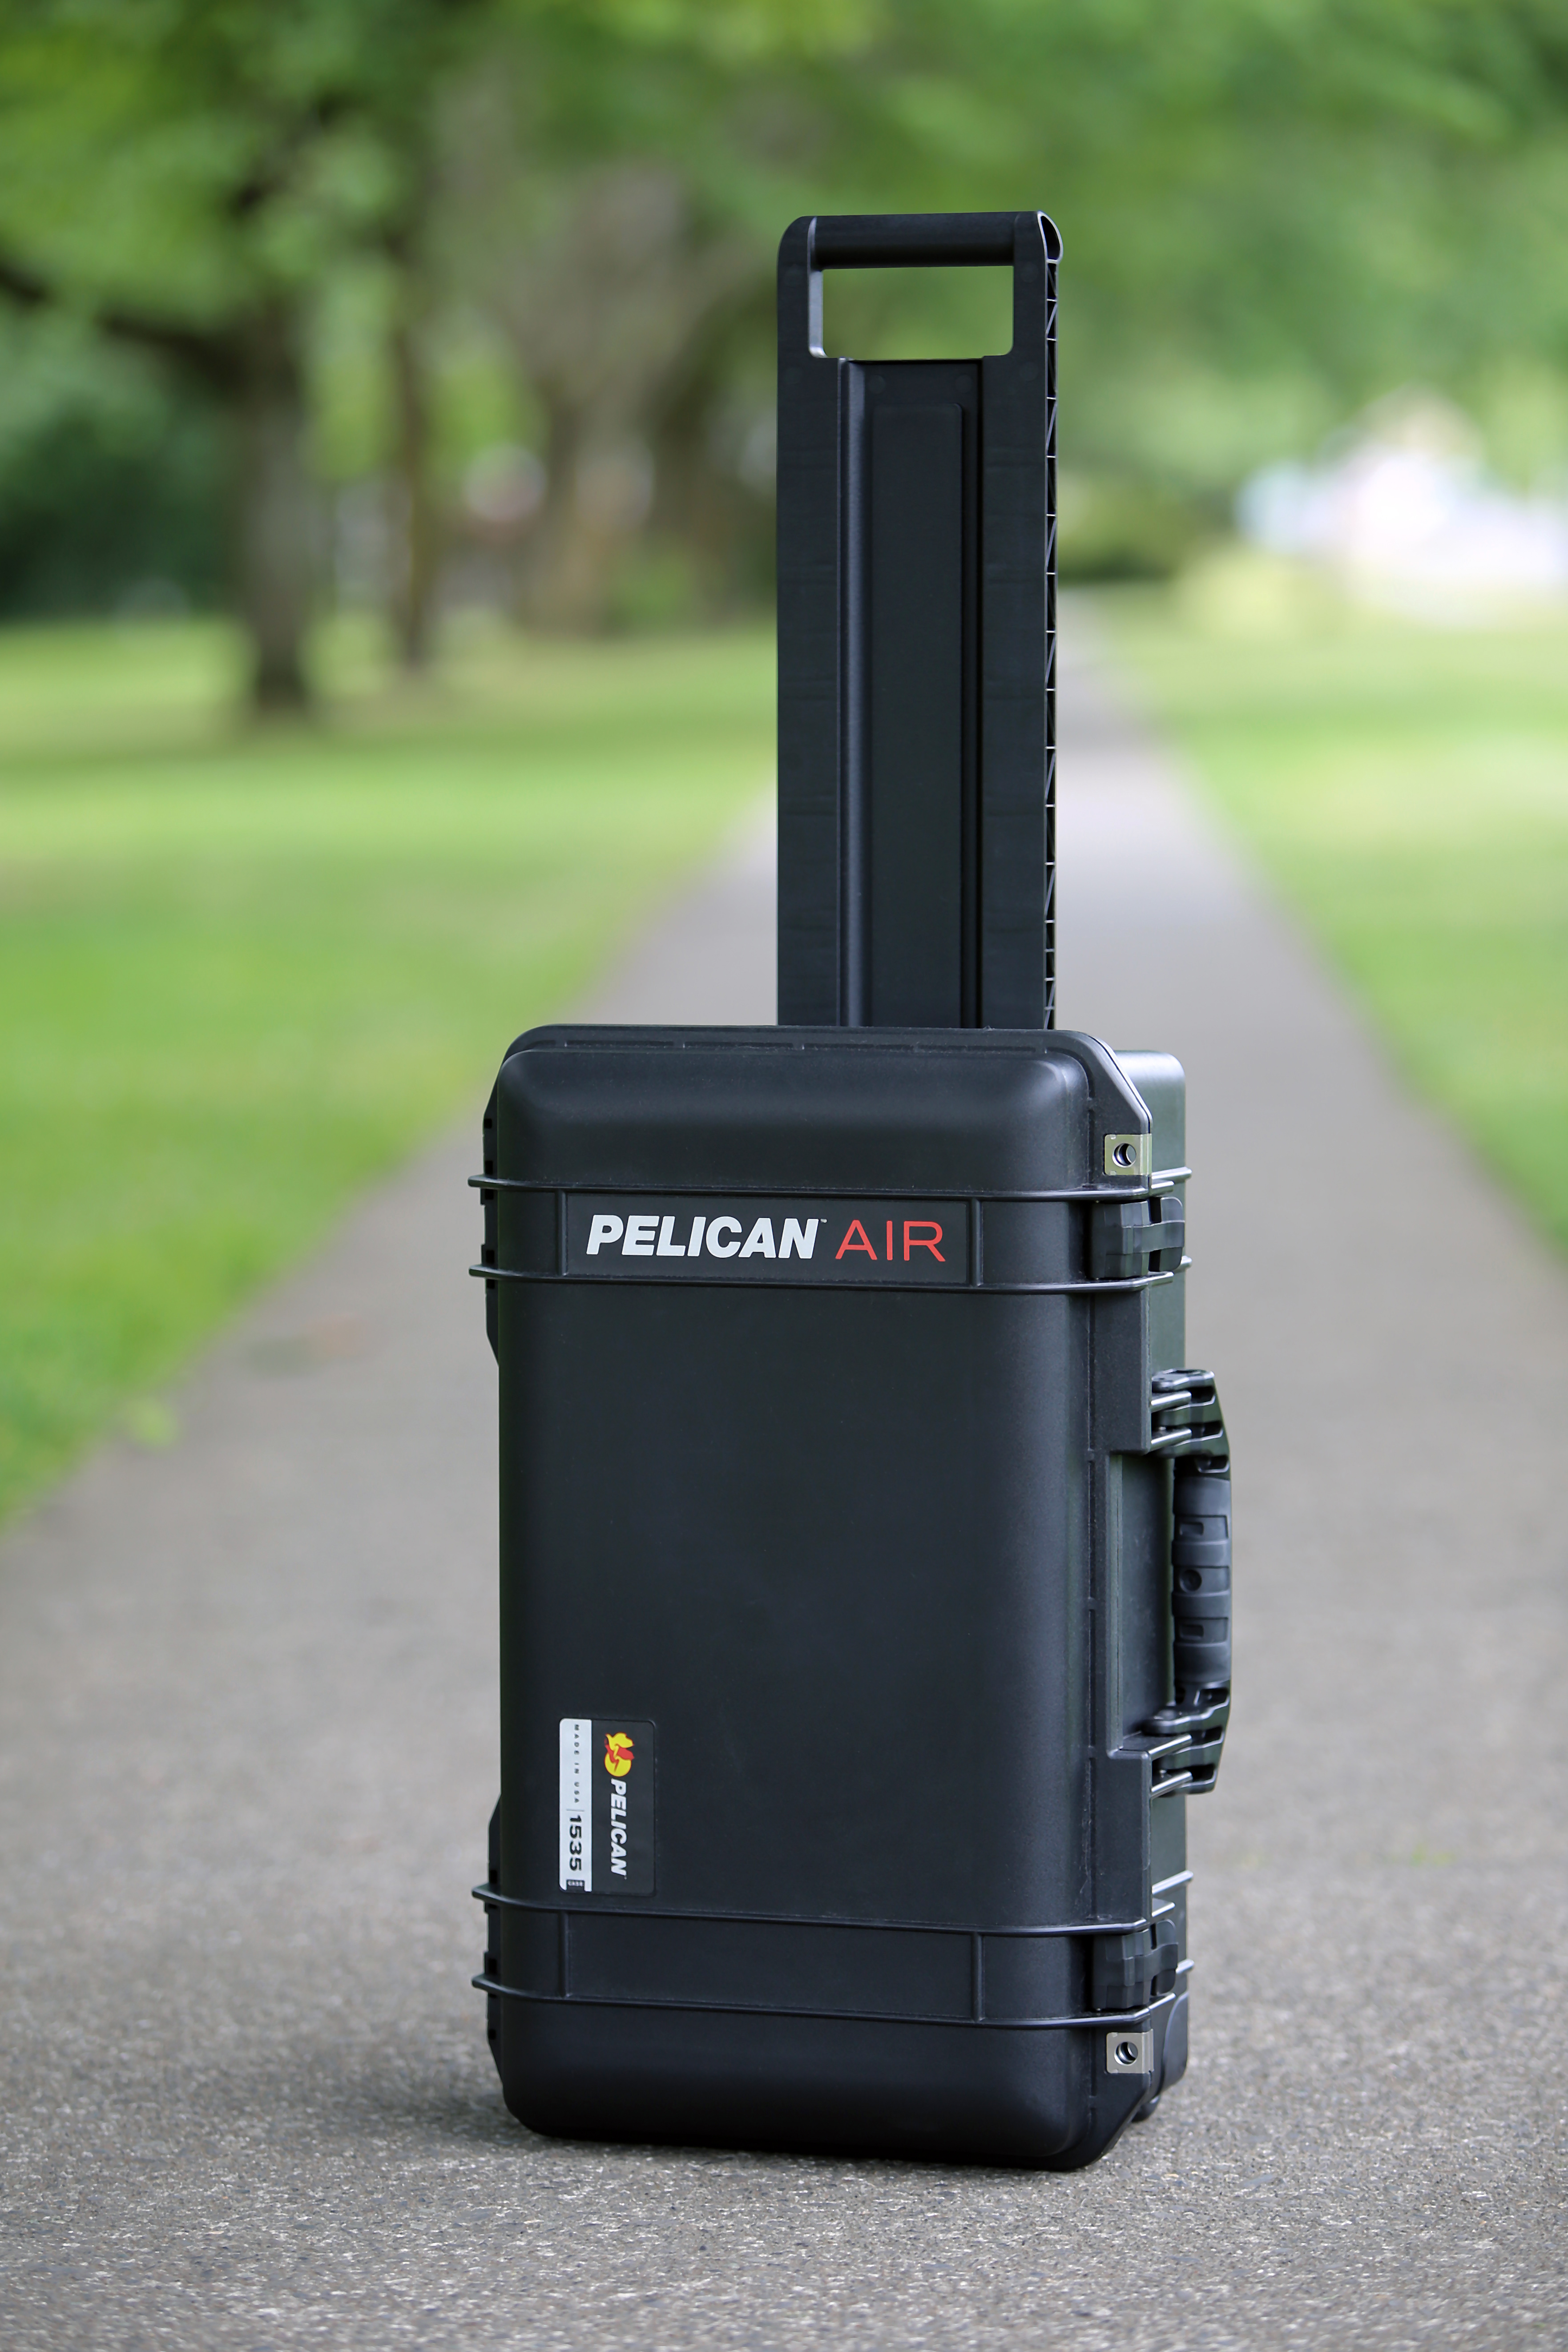 Pelican Air 1535 Rolling Hard Case with TrekPak Dividers ...